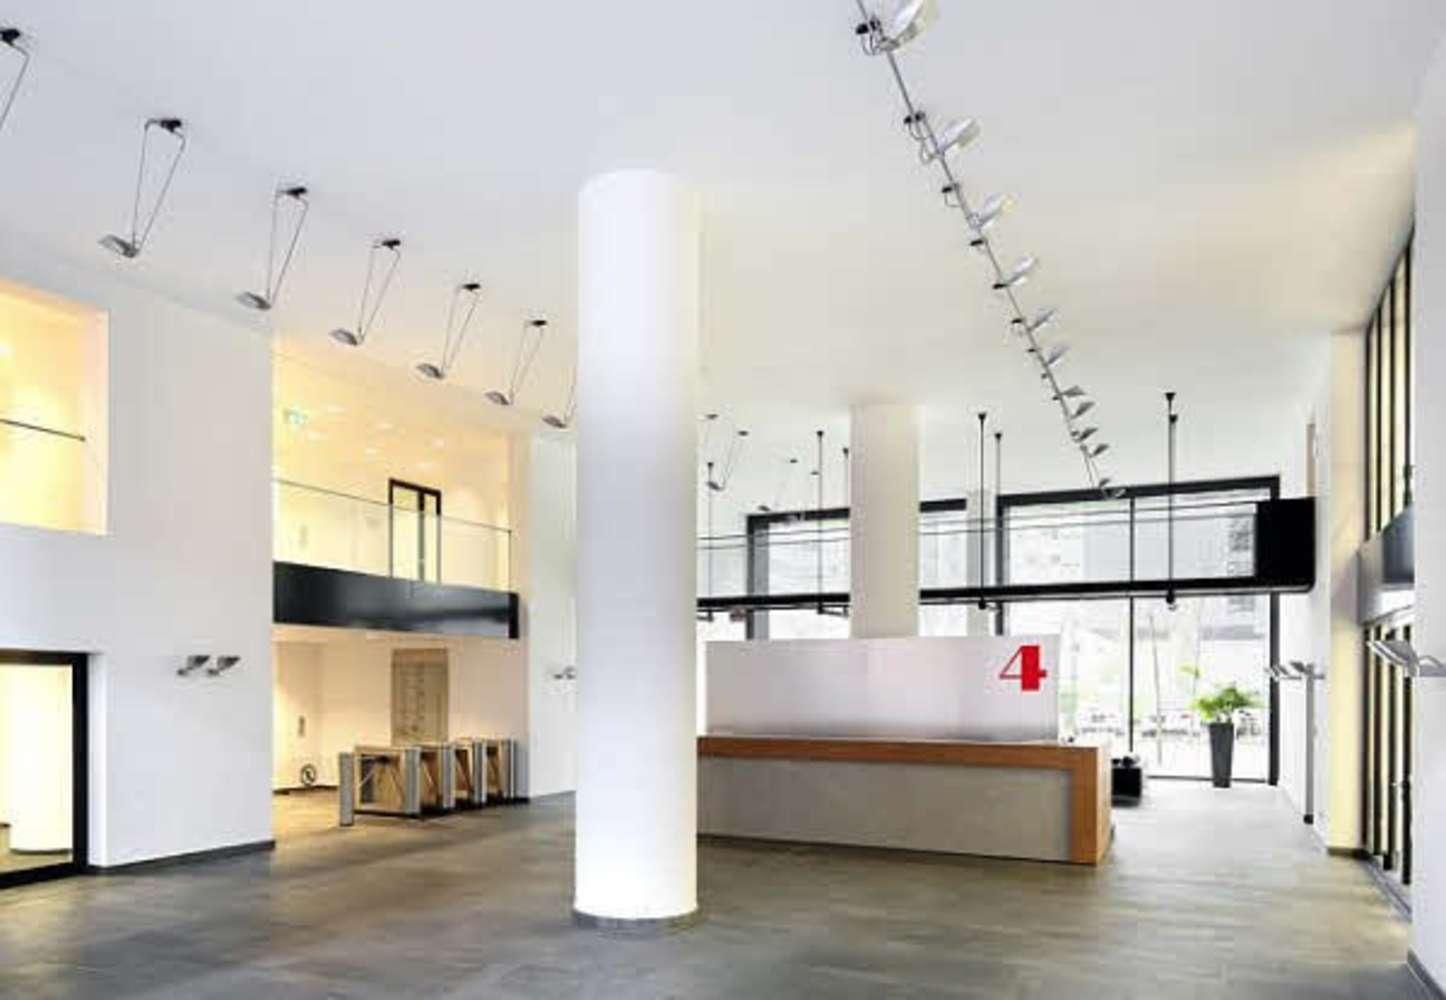 Büros Frankfurt am main, 60528 - Büro - Frankfurt am Main, Schwanheim - F1267 - 9404765